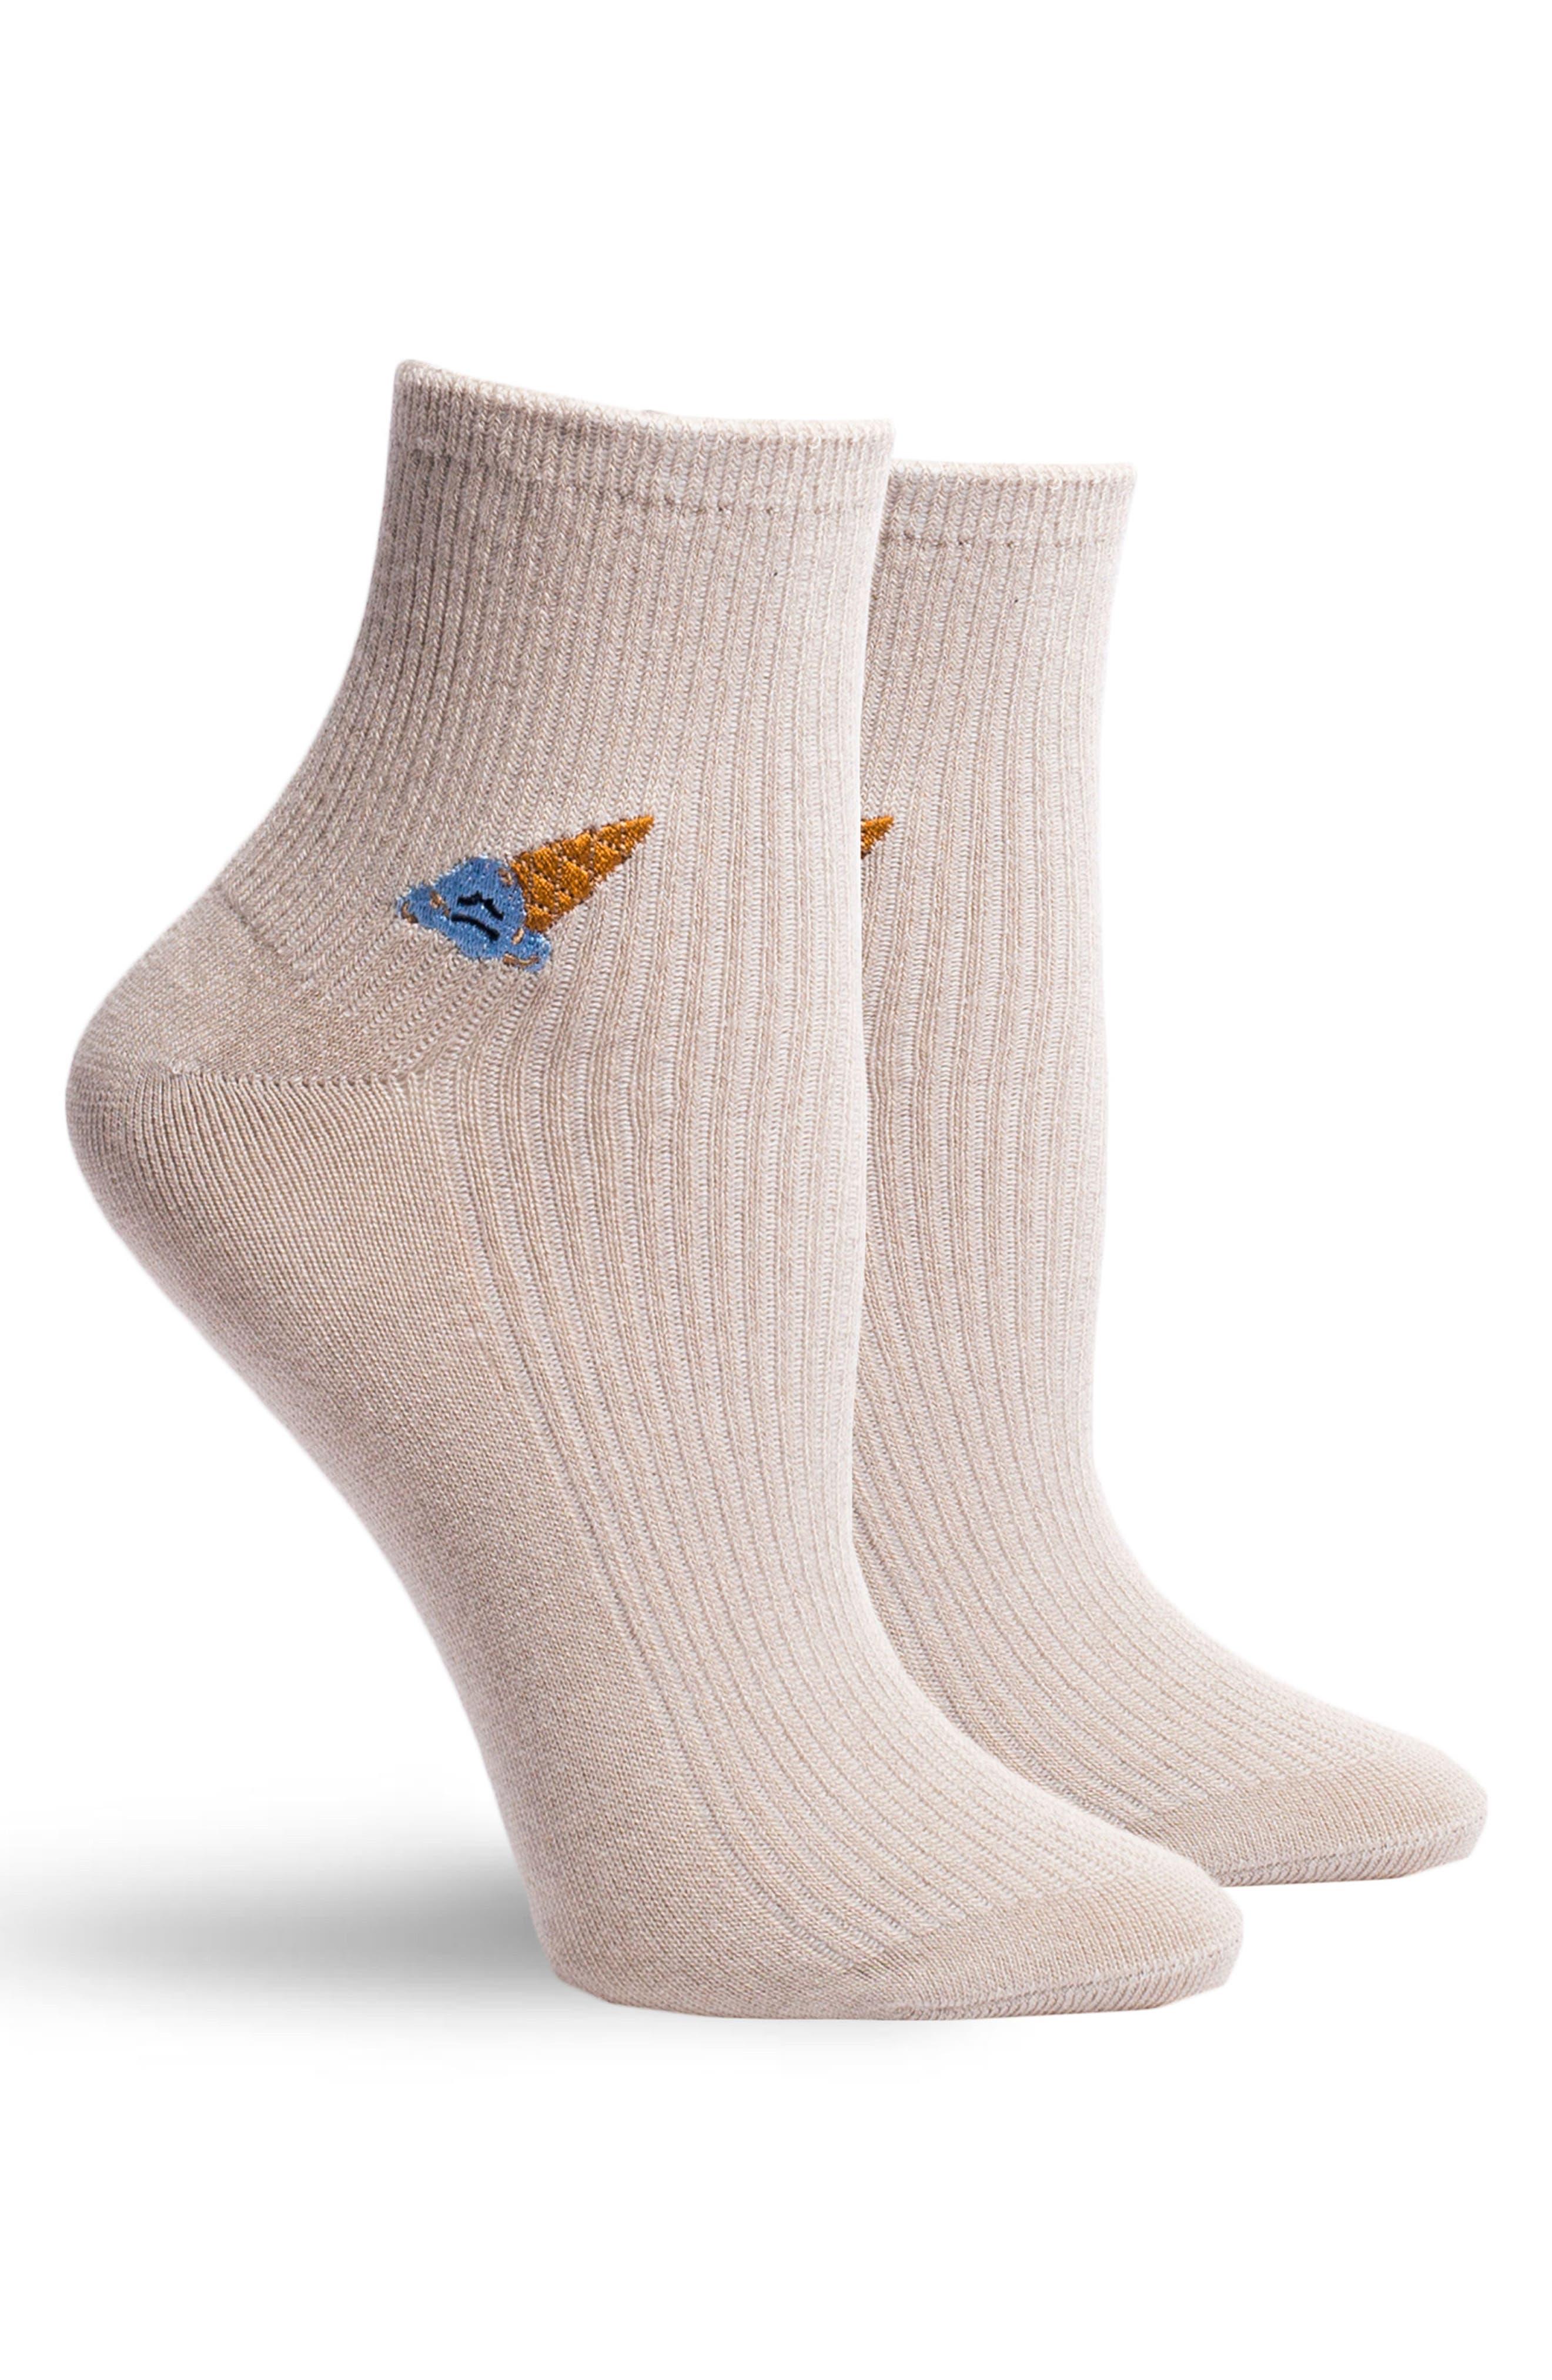 Coney Ankle Socks,                             Alternate thumbnail 2, color,                             Oatmeal